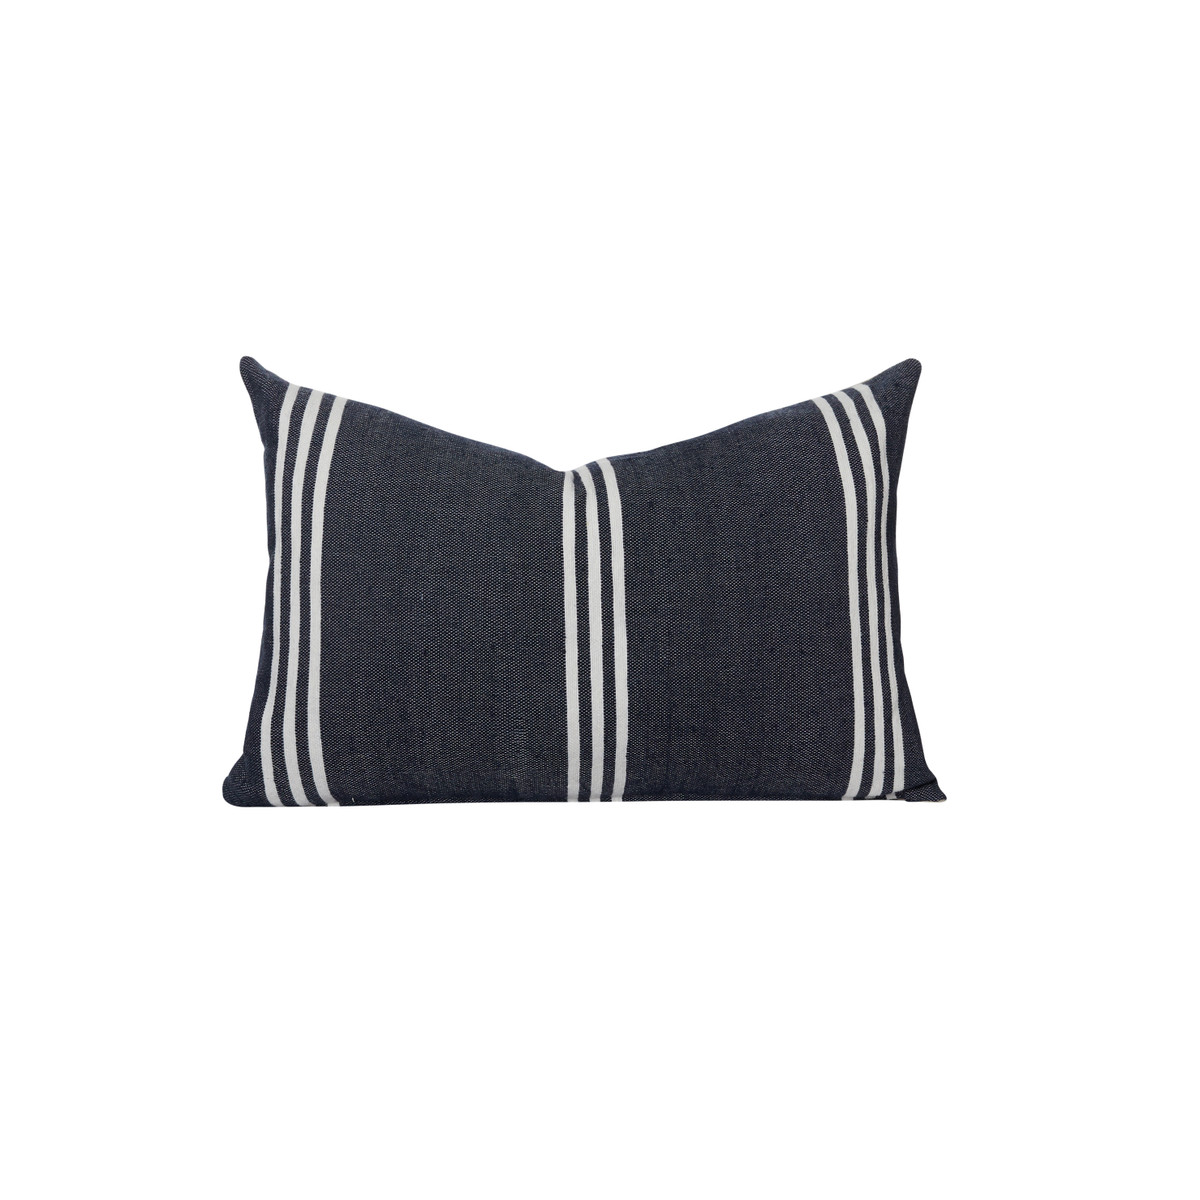 Three Stripe Navy and White Cotton Stripe Moroccan Decorative Lumbar Pillow - front